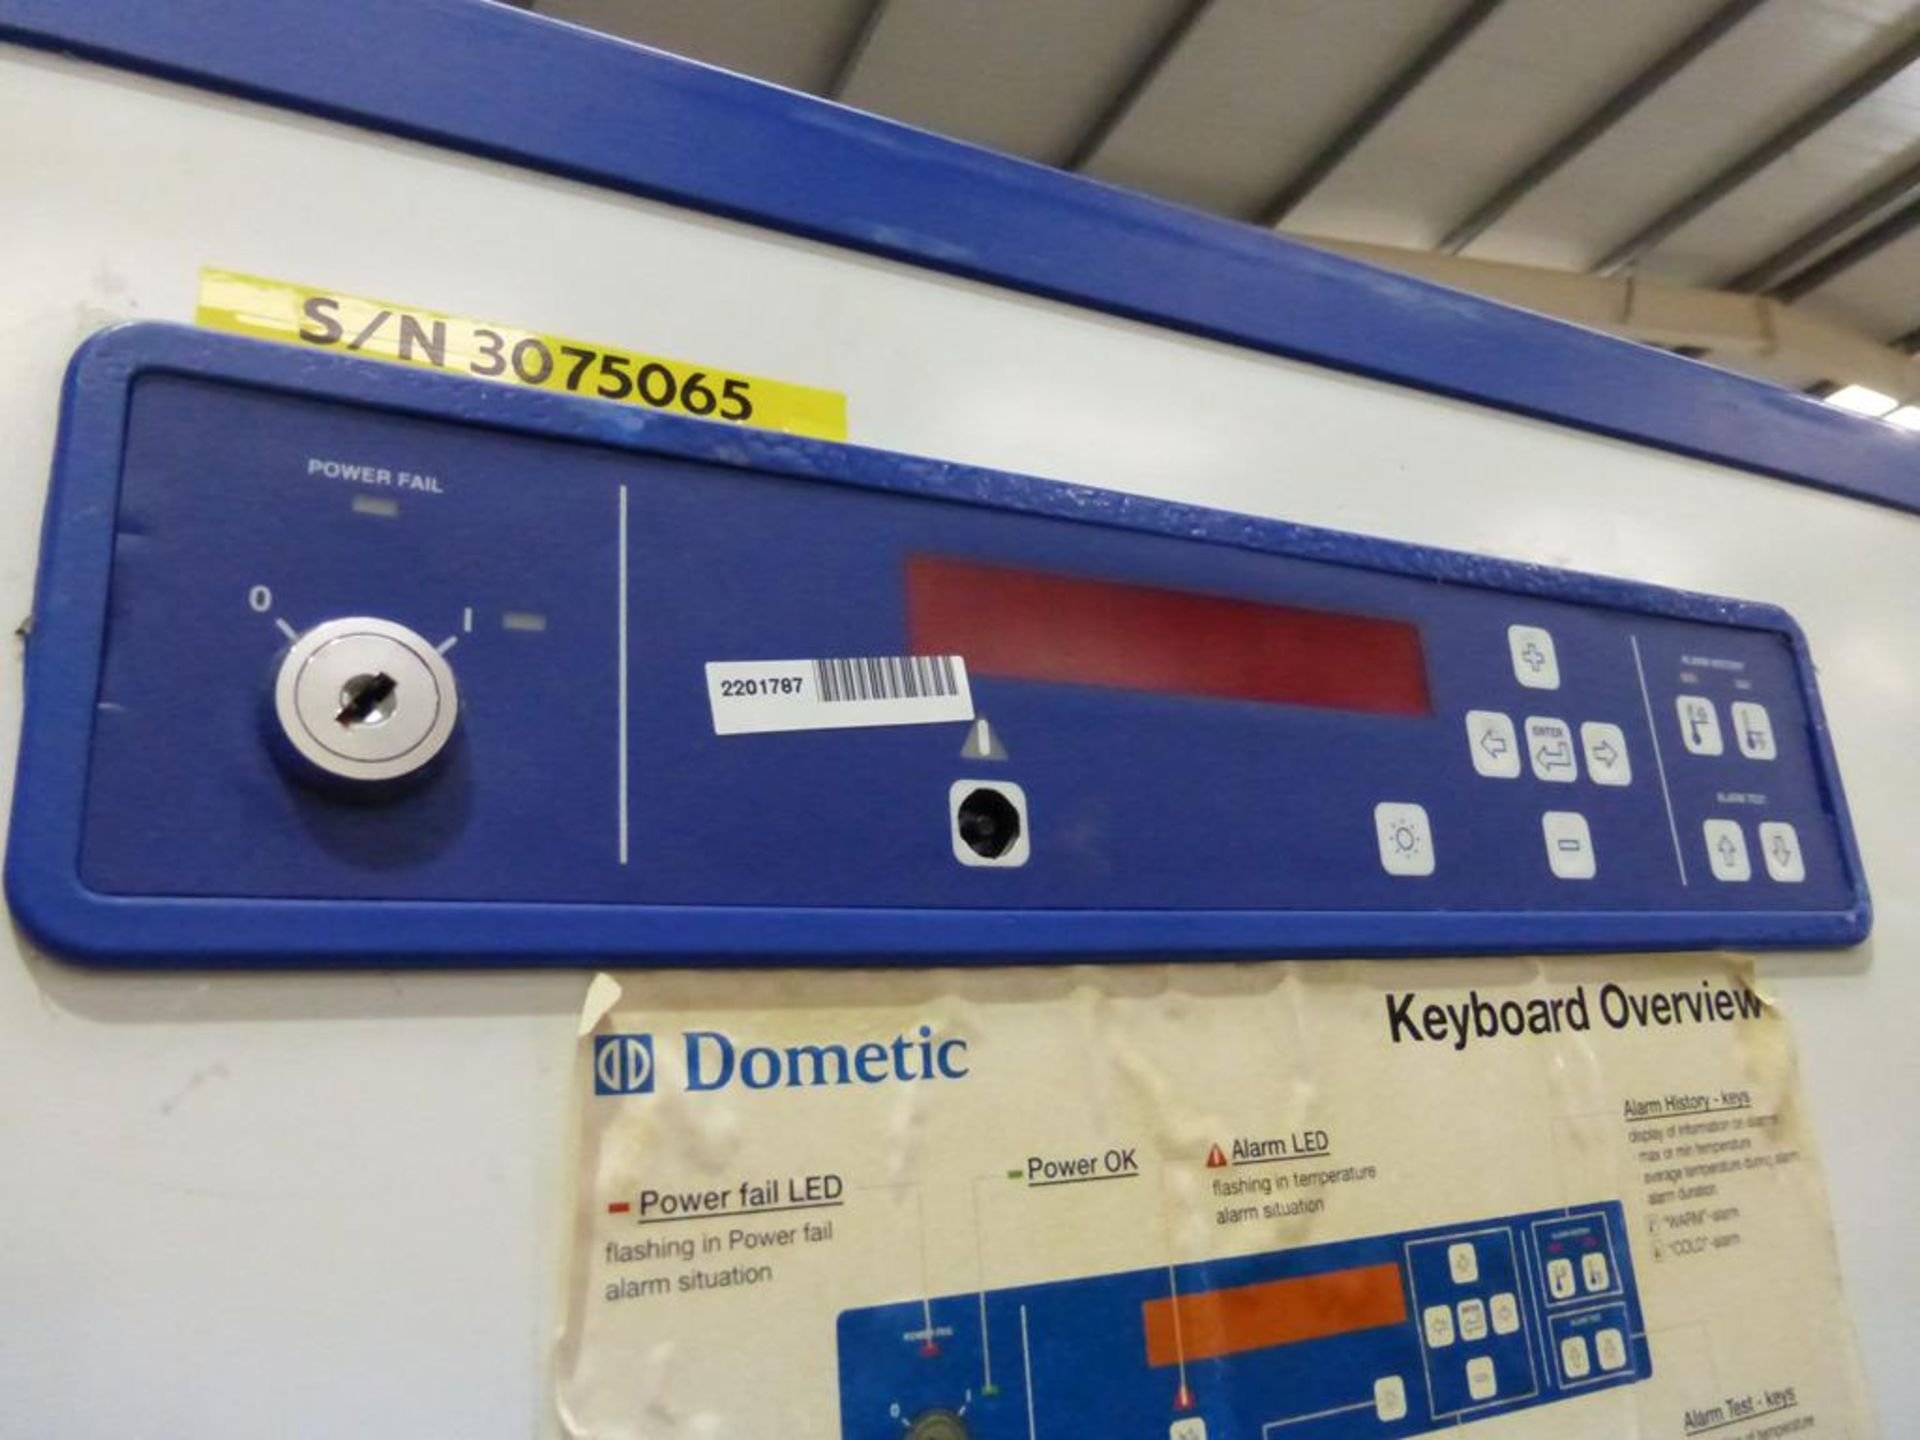 Lot 124 - Dometic Model FR 400 S/N 5081581 240V Laboratory/M